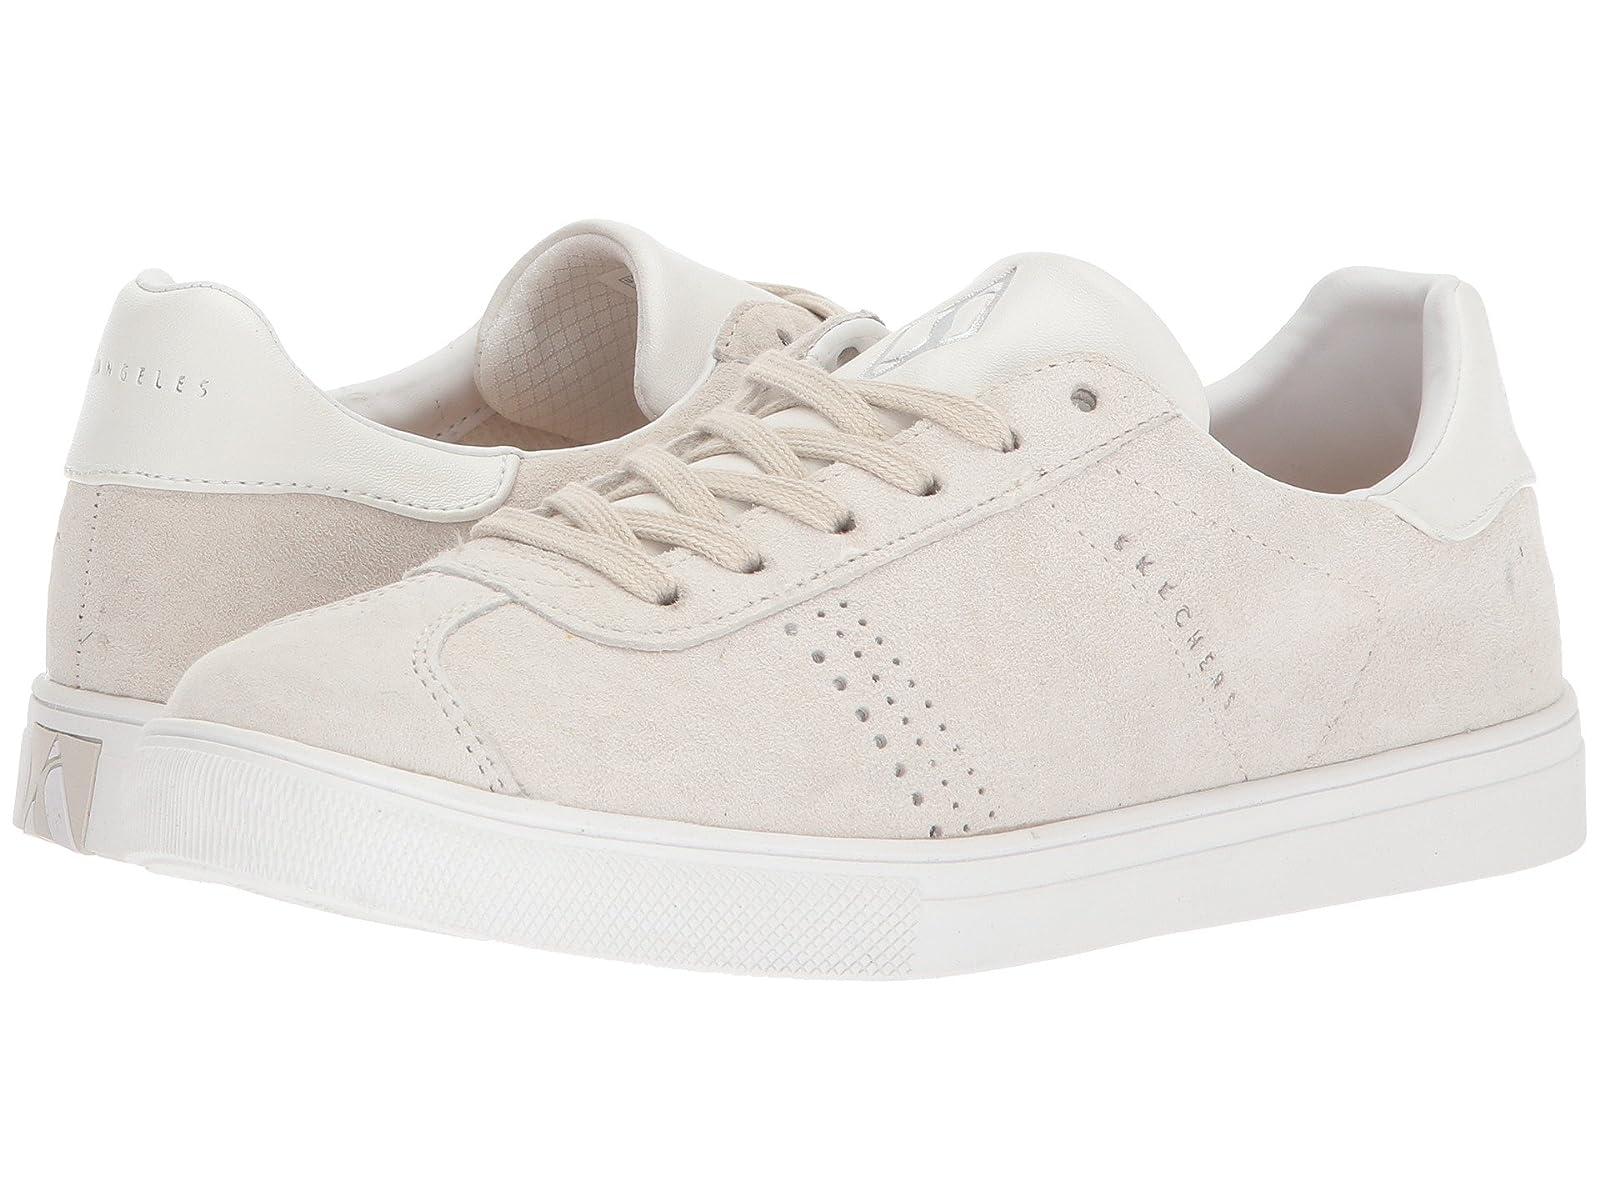 SKECHERS Moda - PerswayedAtmospheric grades have affordable shoes